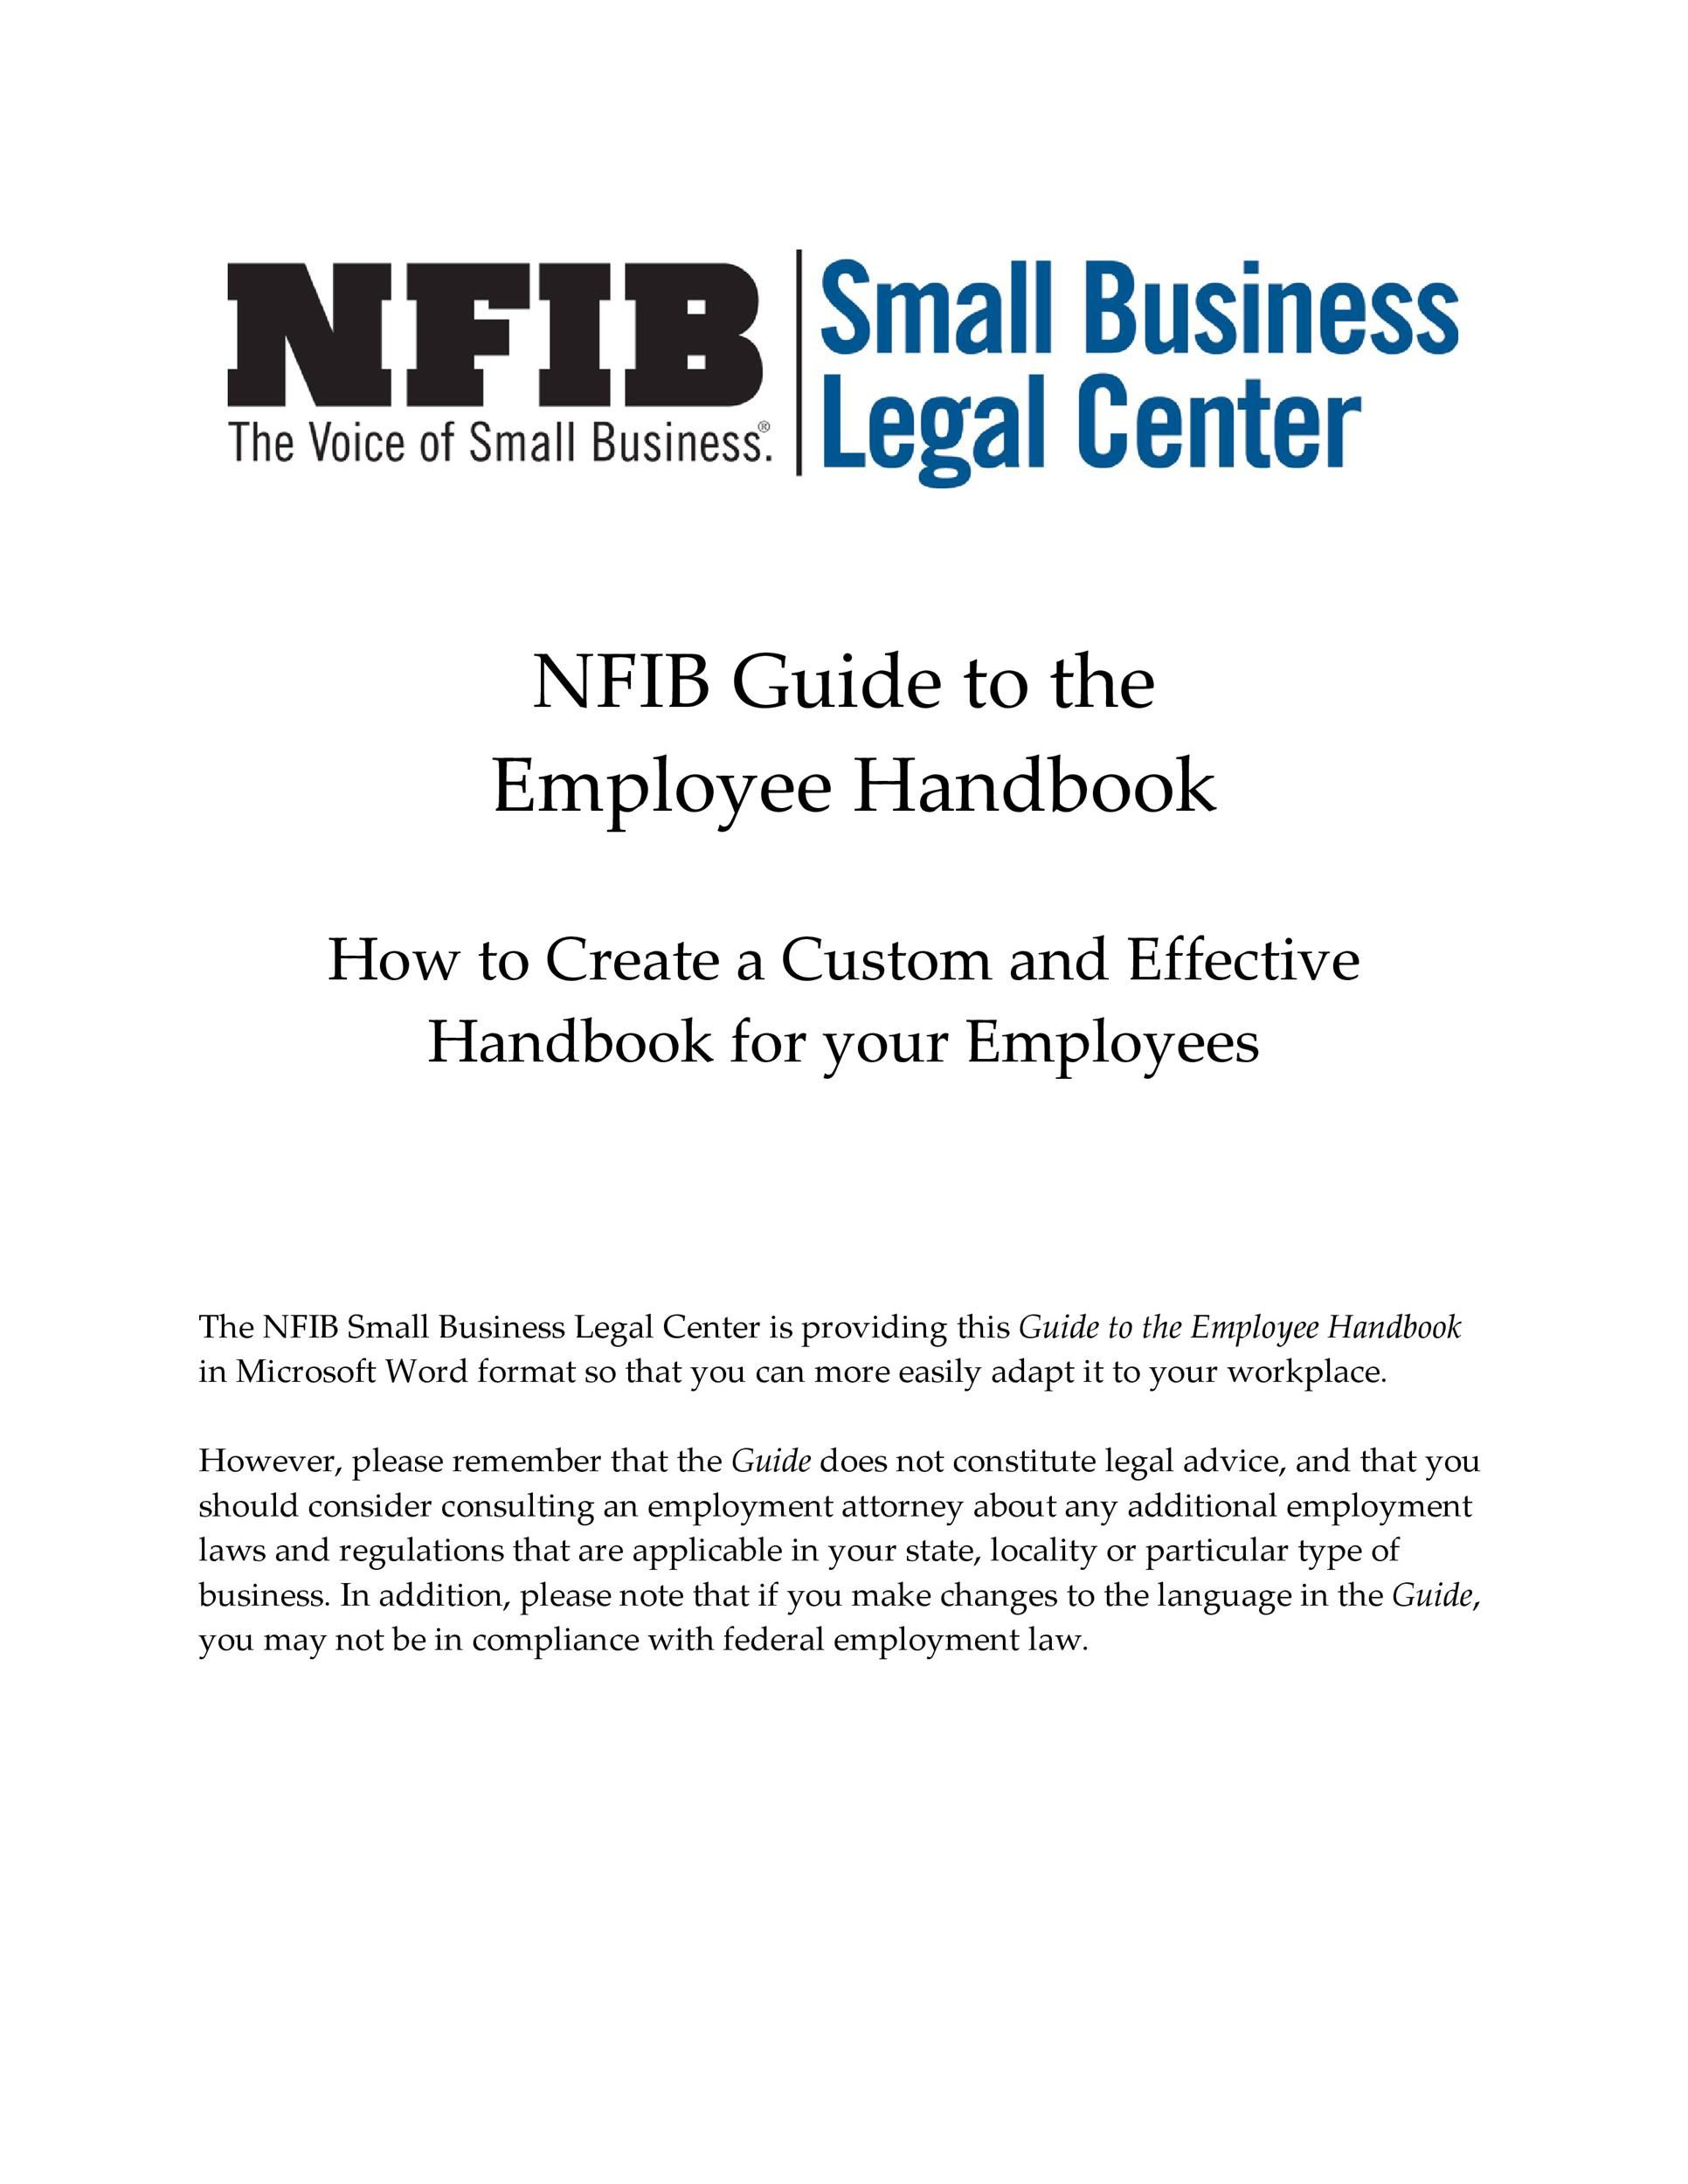 004 Outstanding Free Employee Handbook Template Word High Resolution  Sample In Training ManualFull